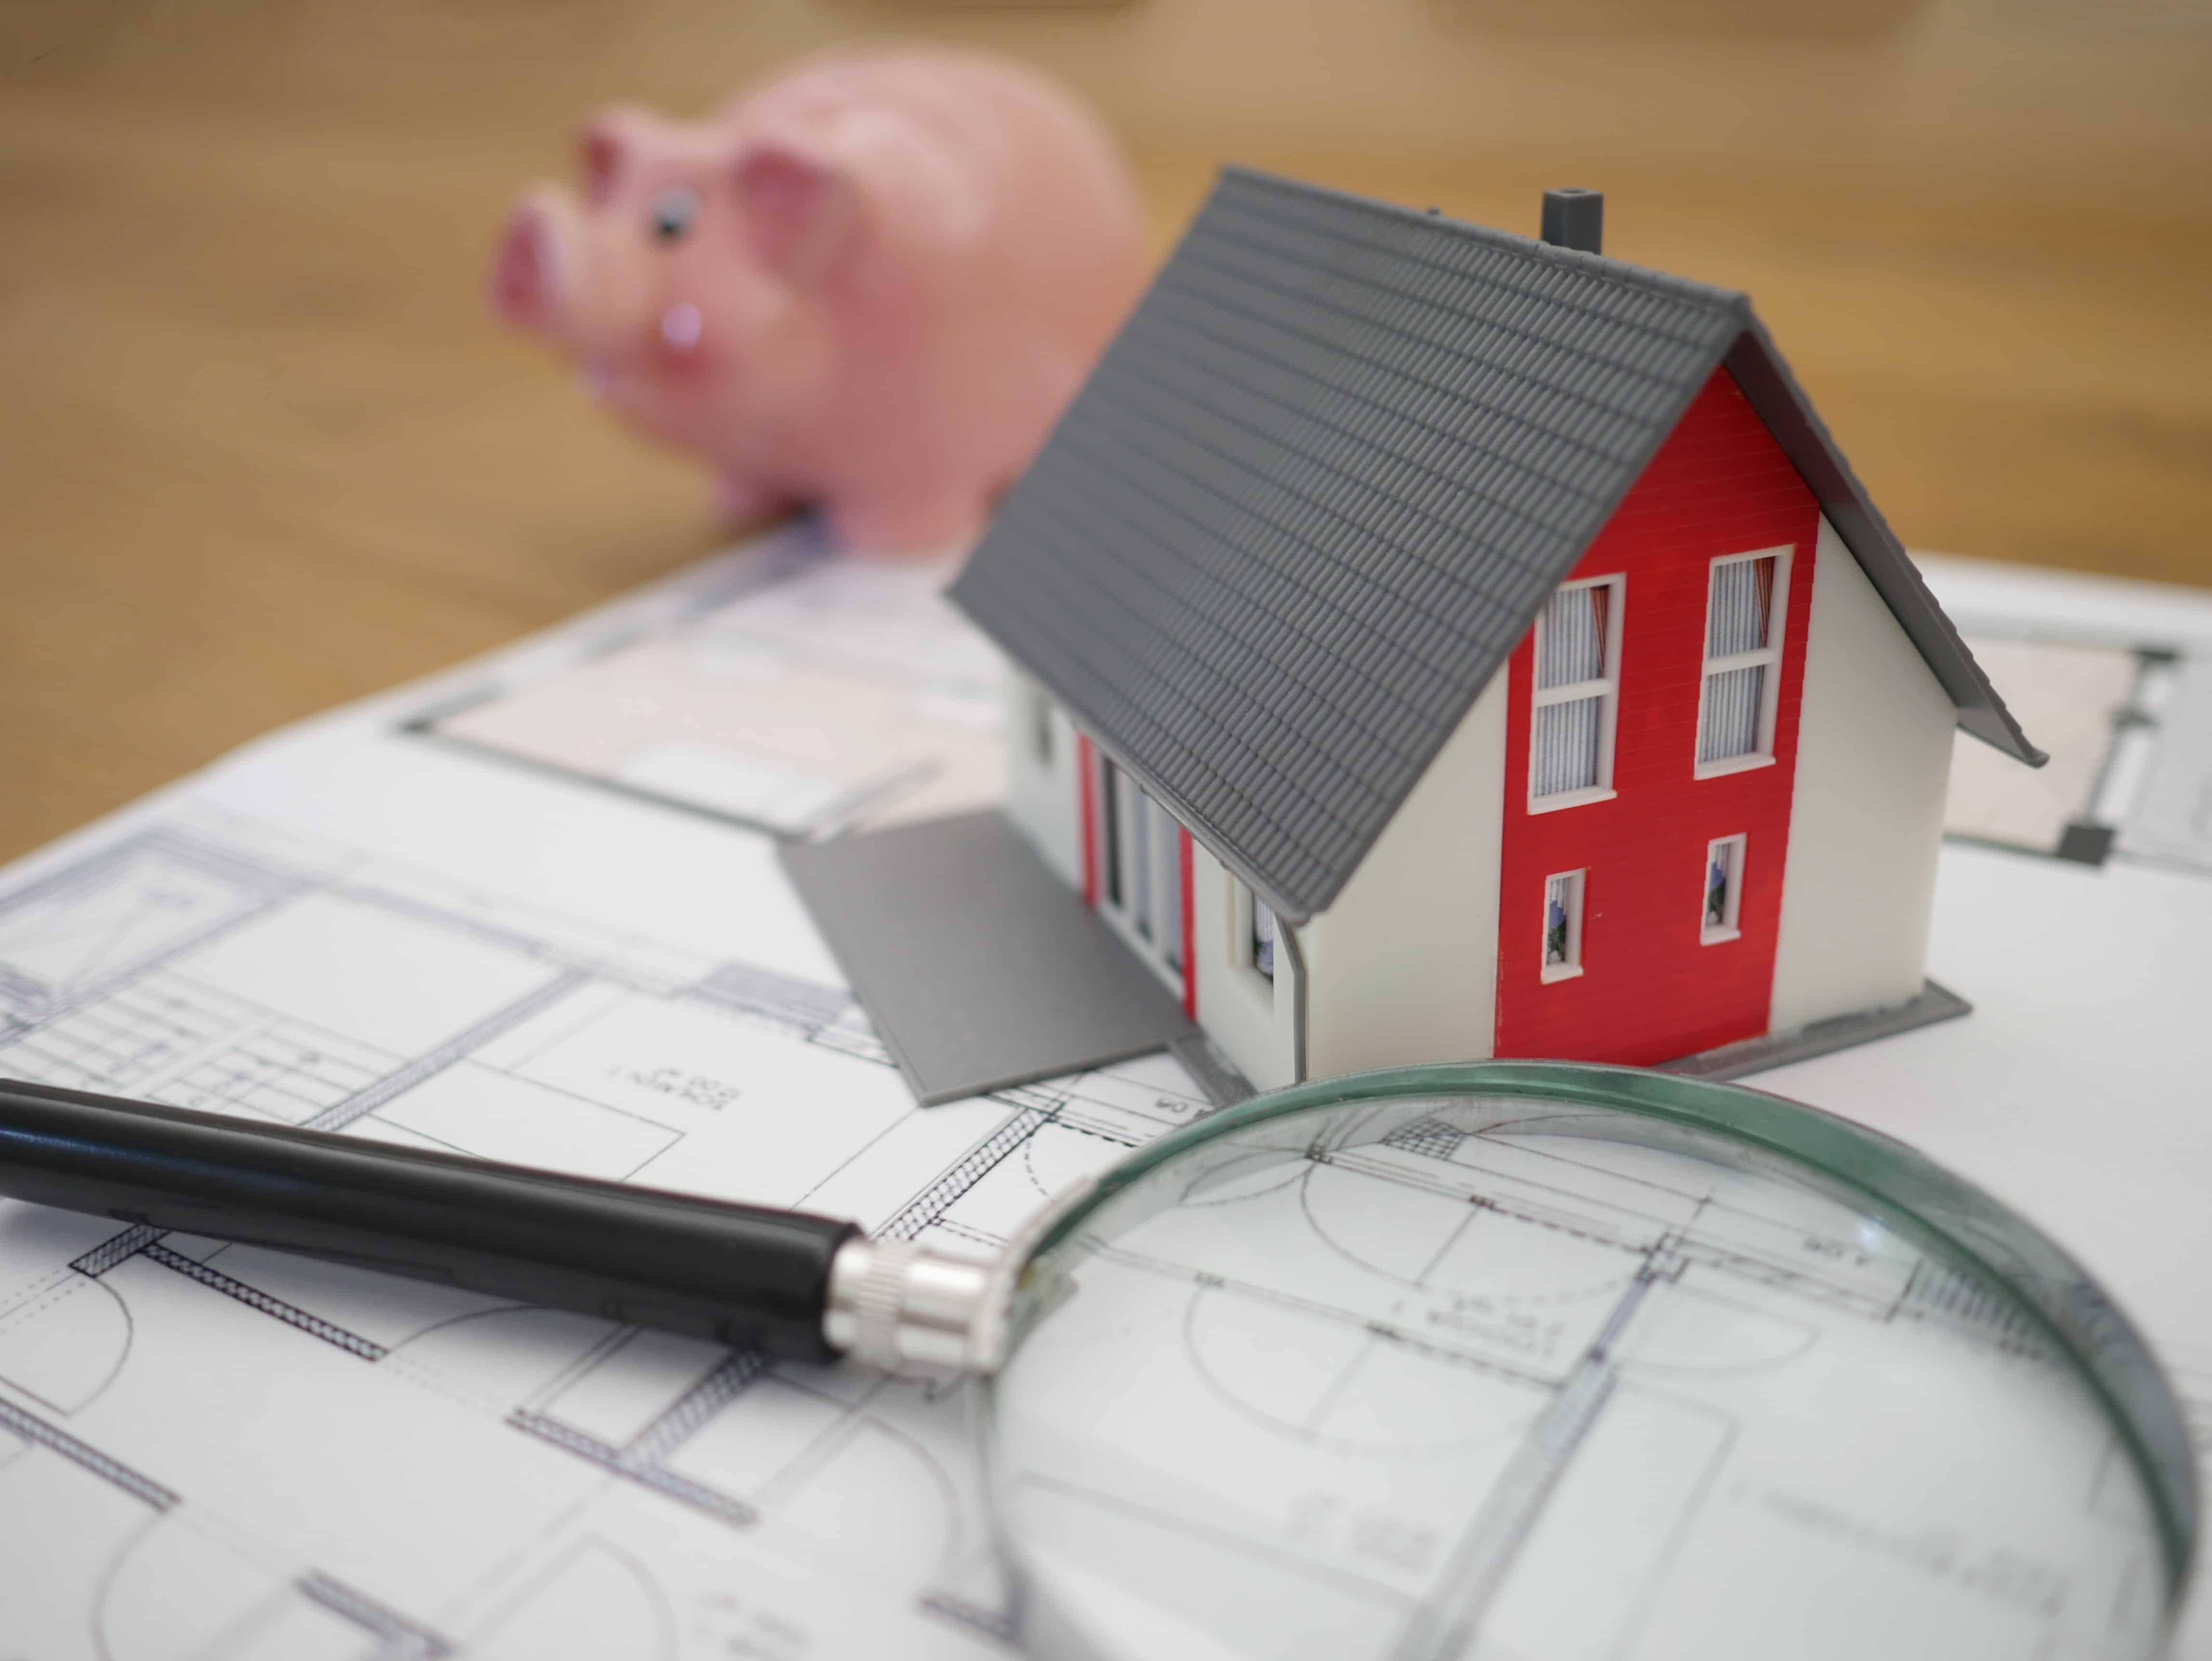 Quand demander un permis de construire ? 1